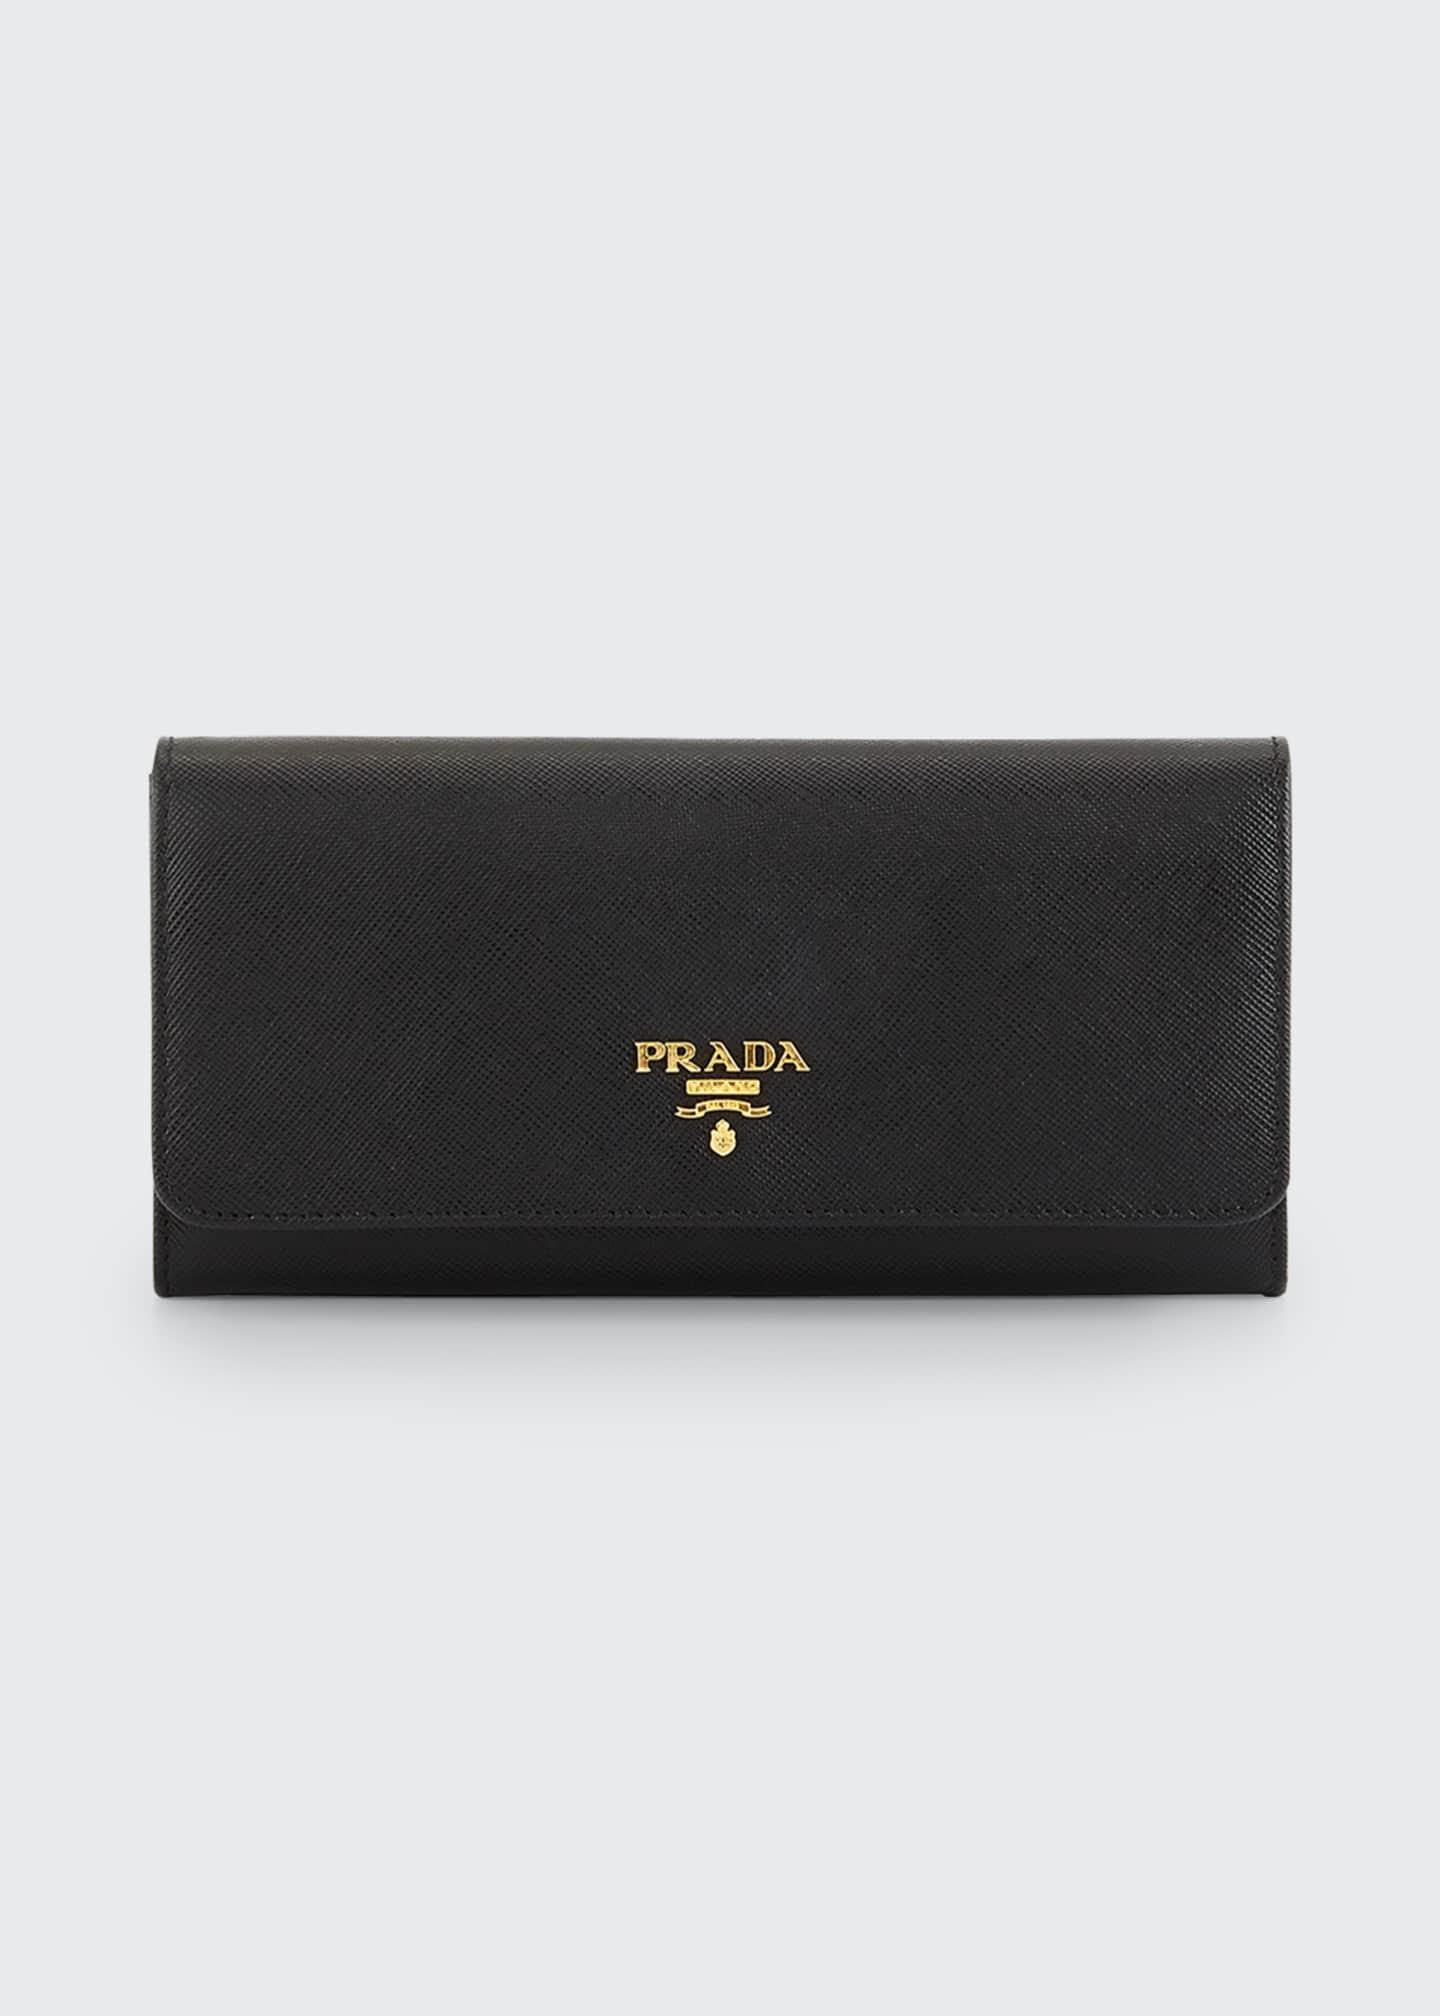 Prada Textured Leather Continental Wallet